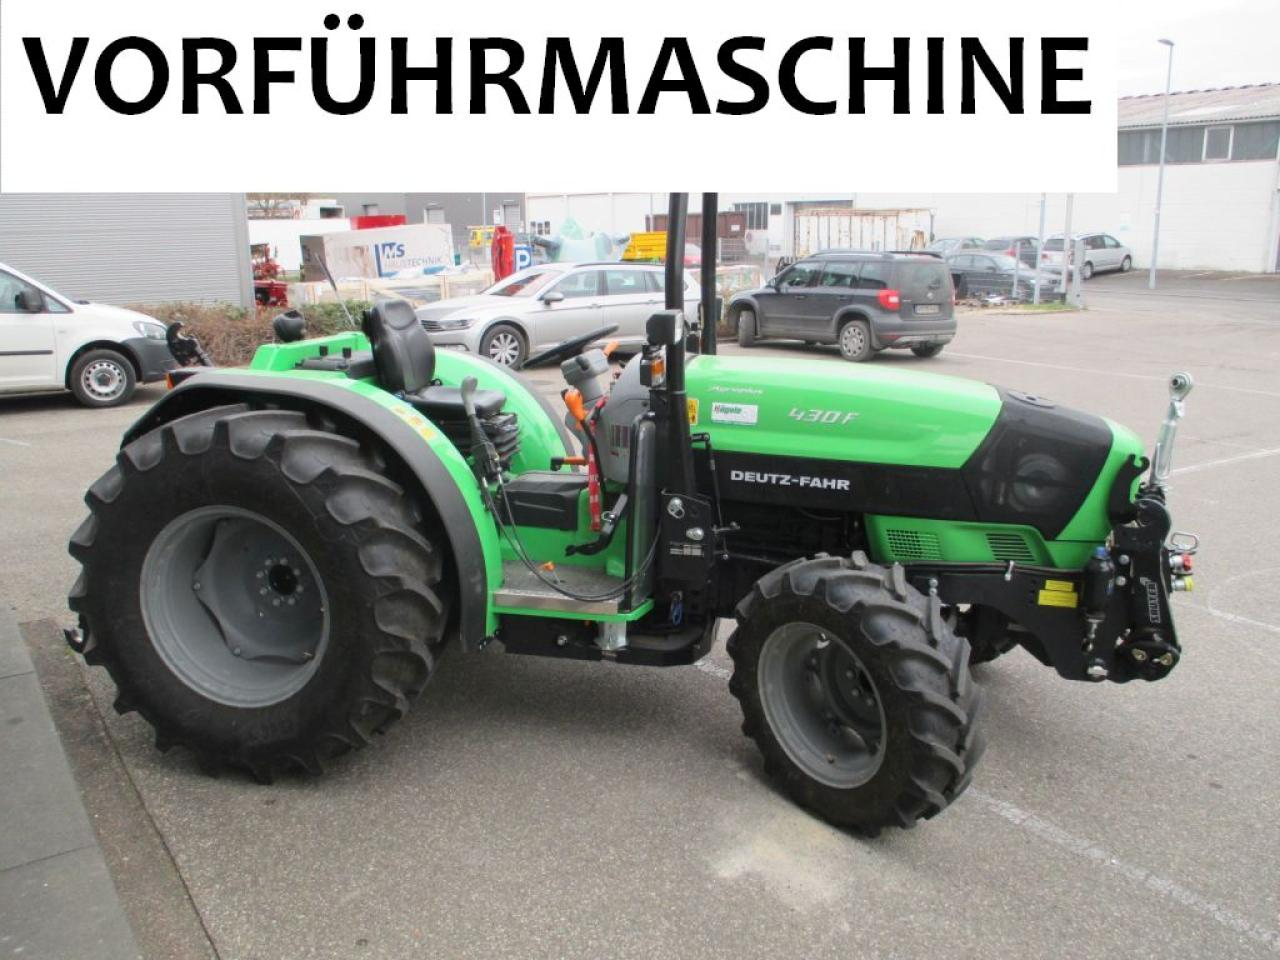 Top3Maschine